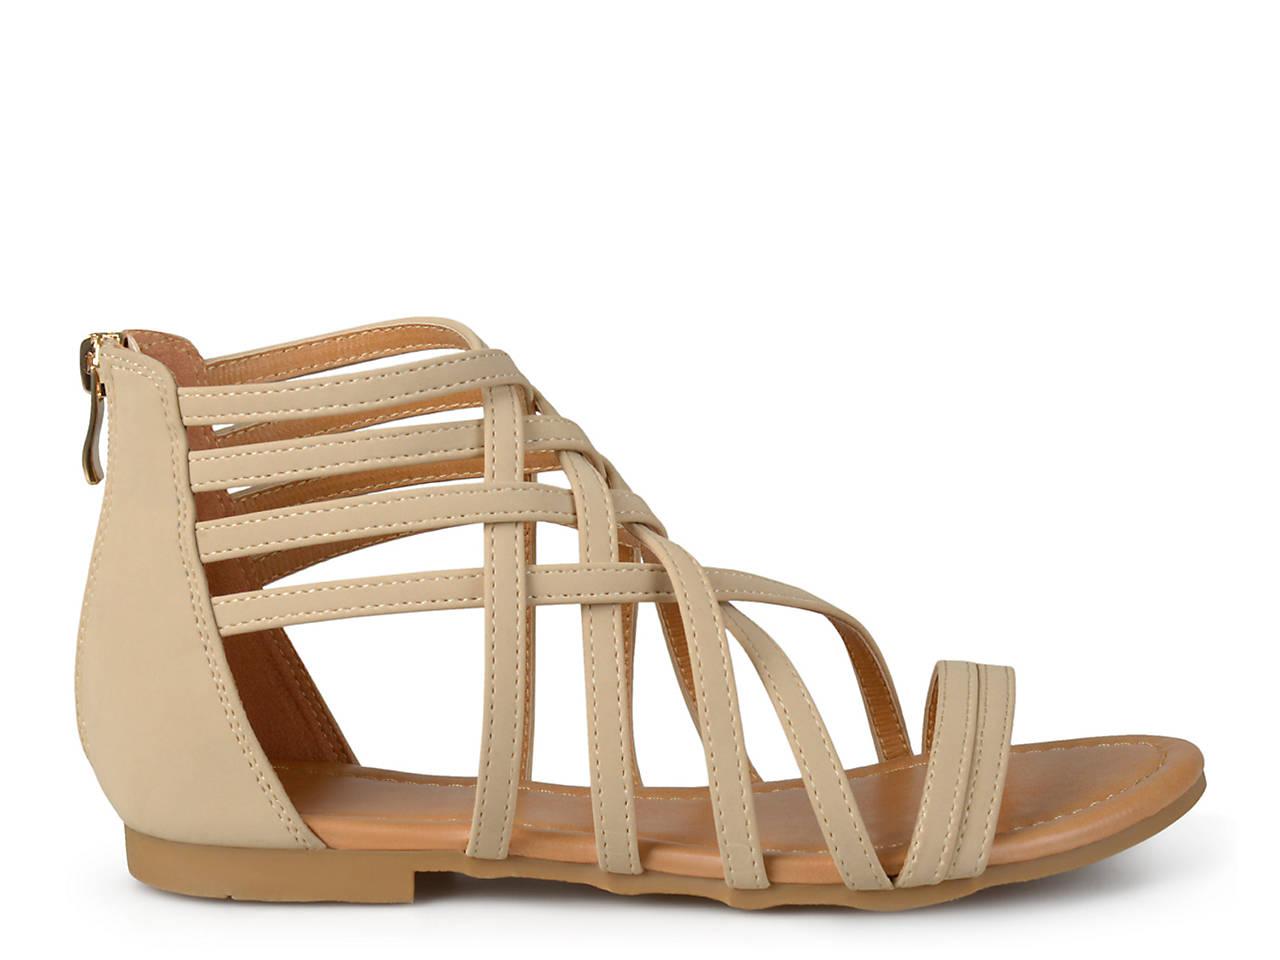 c288d5ac7e3ef4 Journee Collection Hanni Gladiator Sandal Women s Shoes